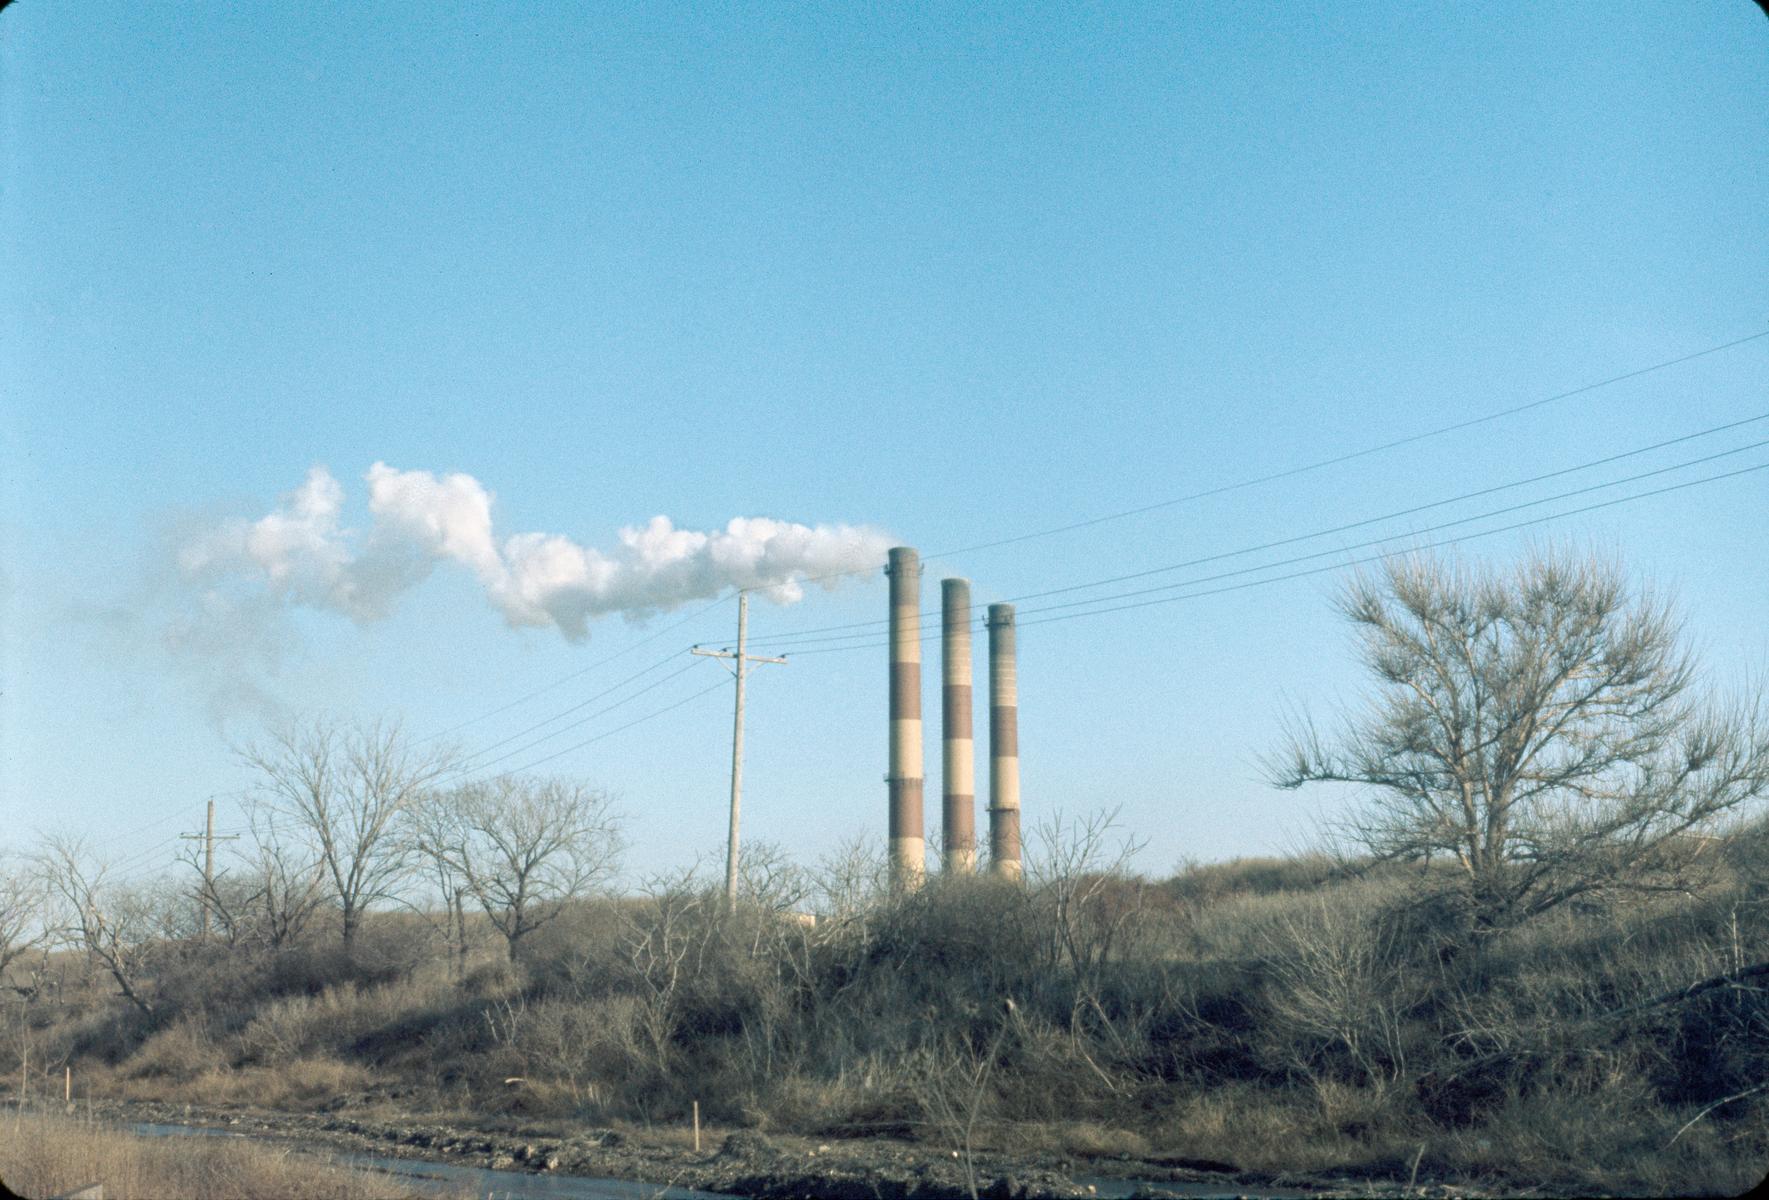 City Incinerator smokestacks